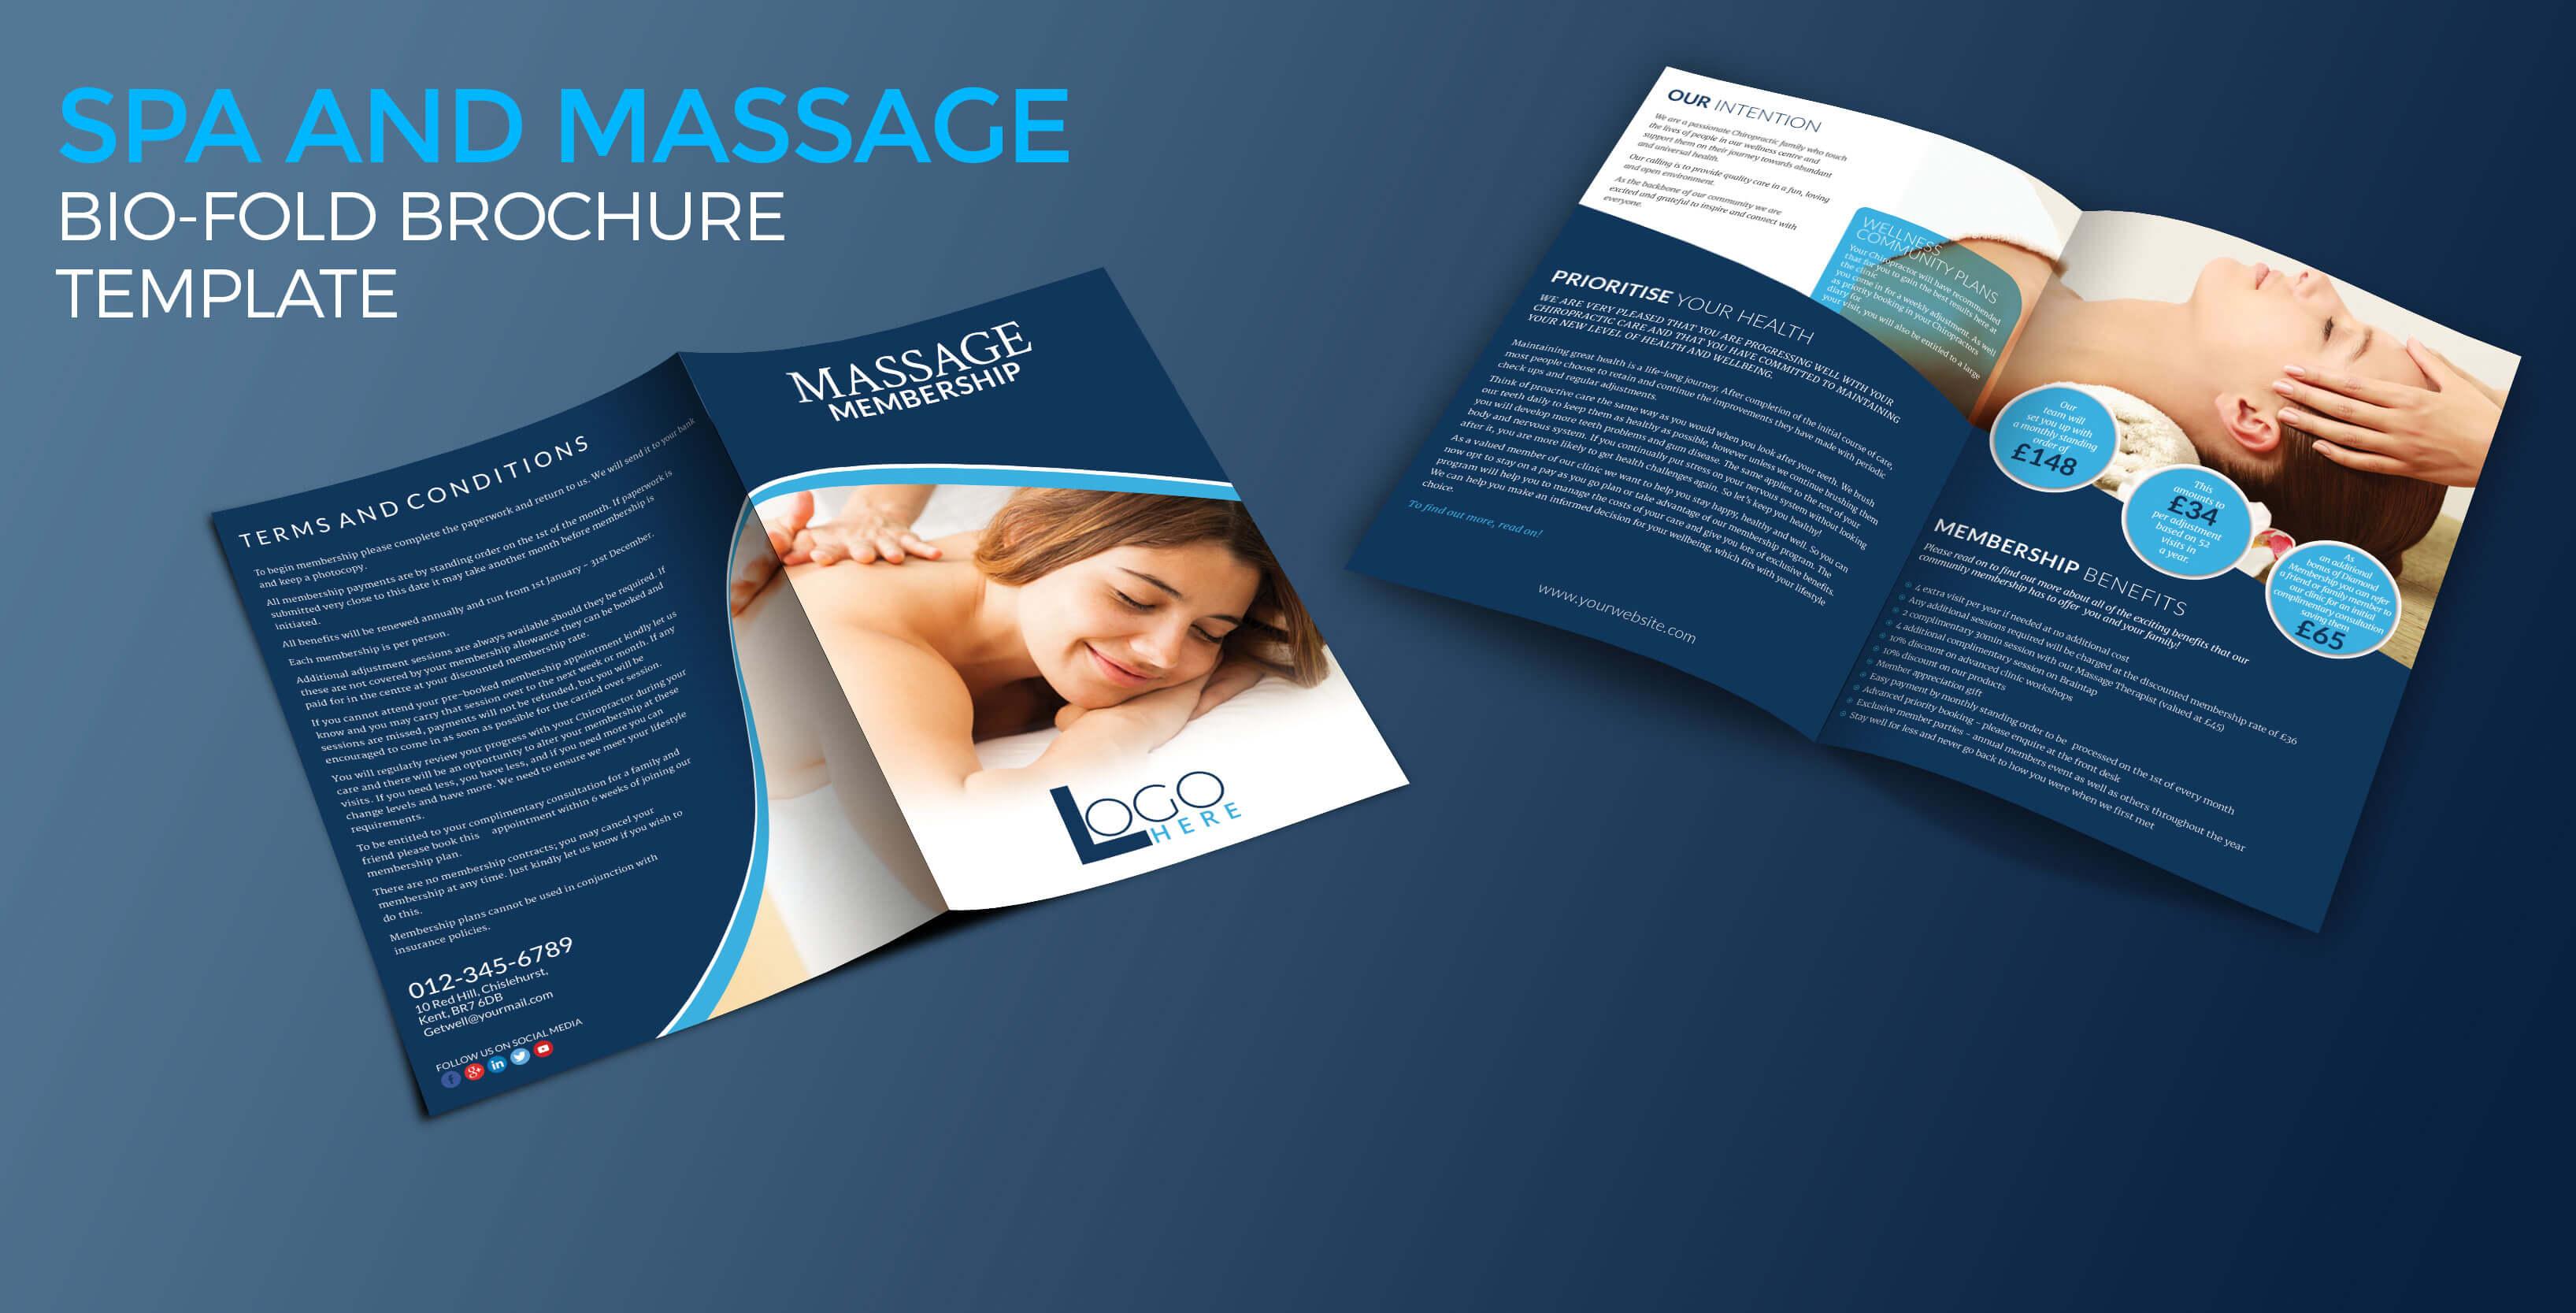 Spa And Massage Bio-Fold Brochure Template - Graphic Reserve inside Membership Brochure Template